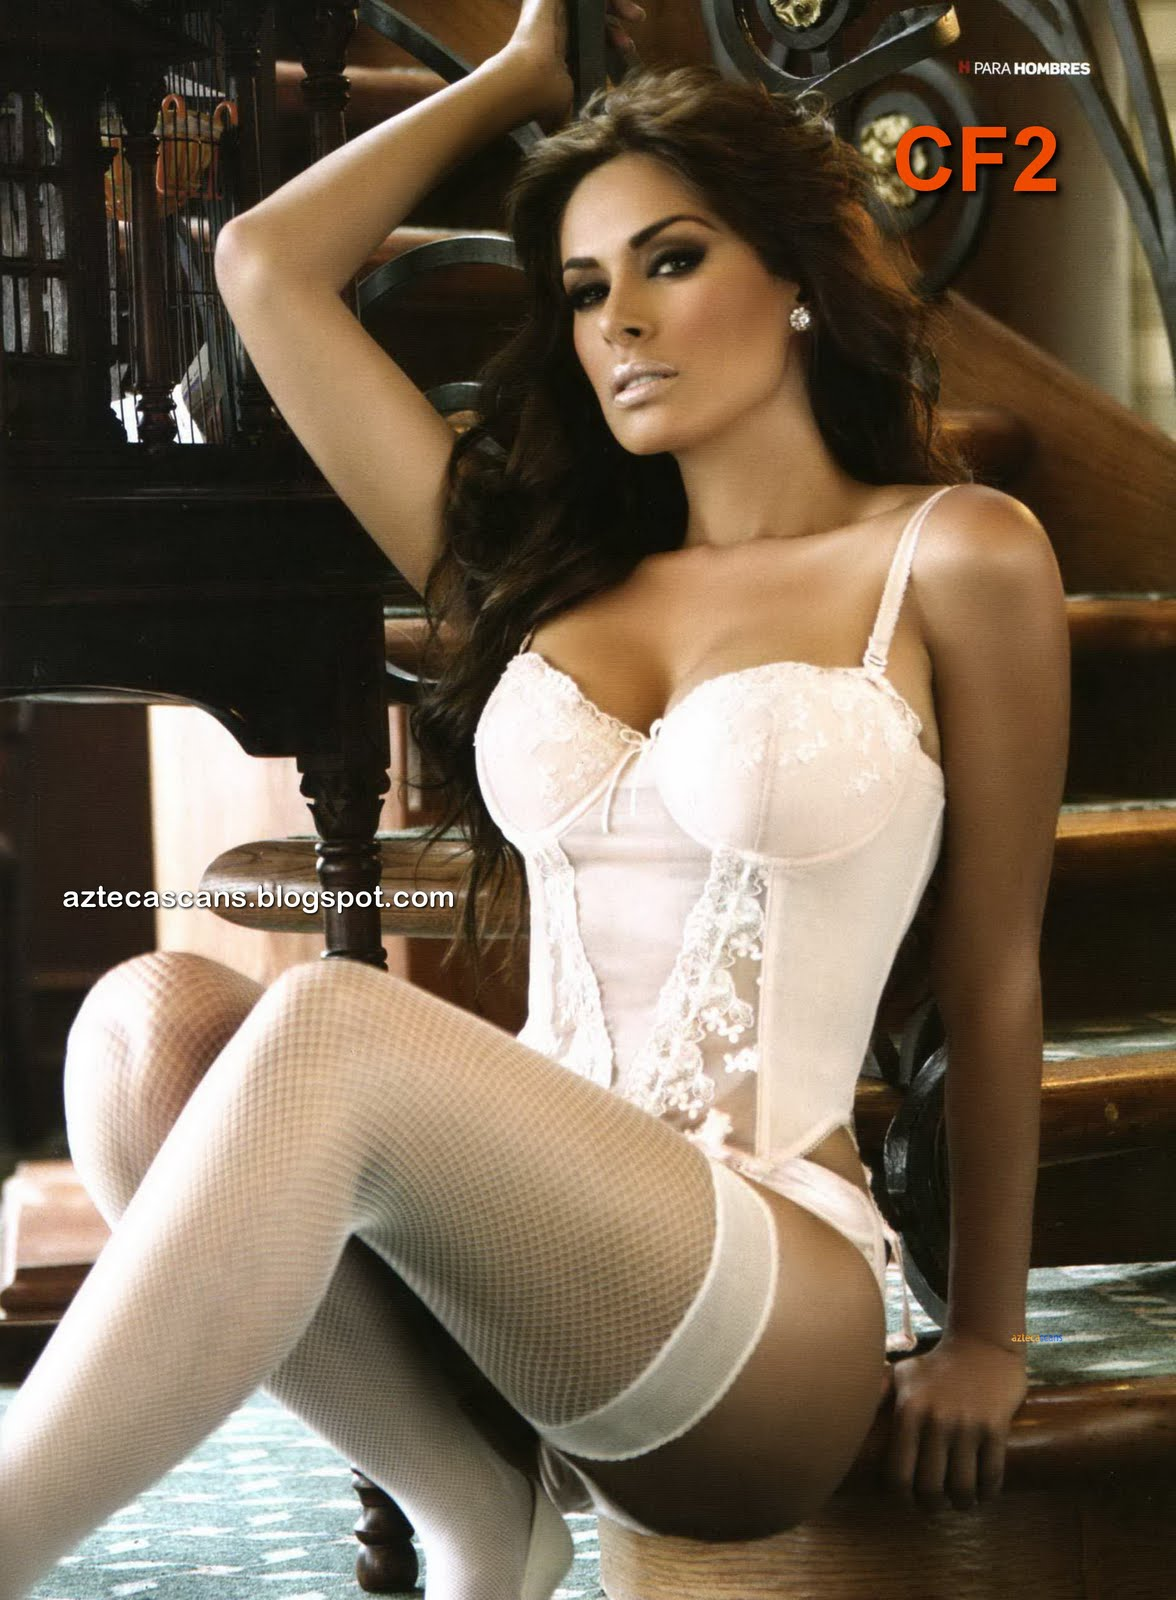 fotos galilea montijo desnuda: